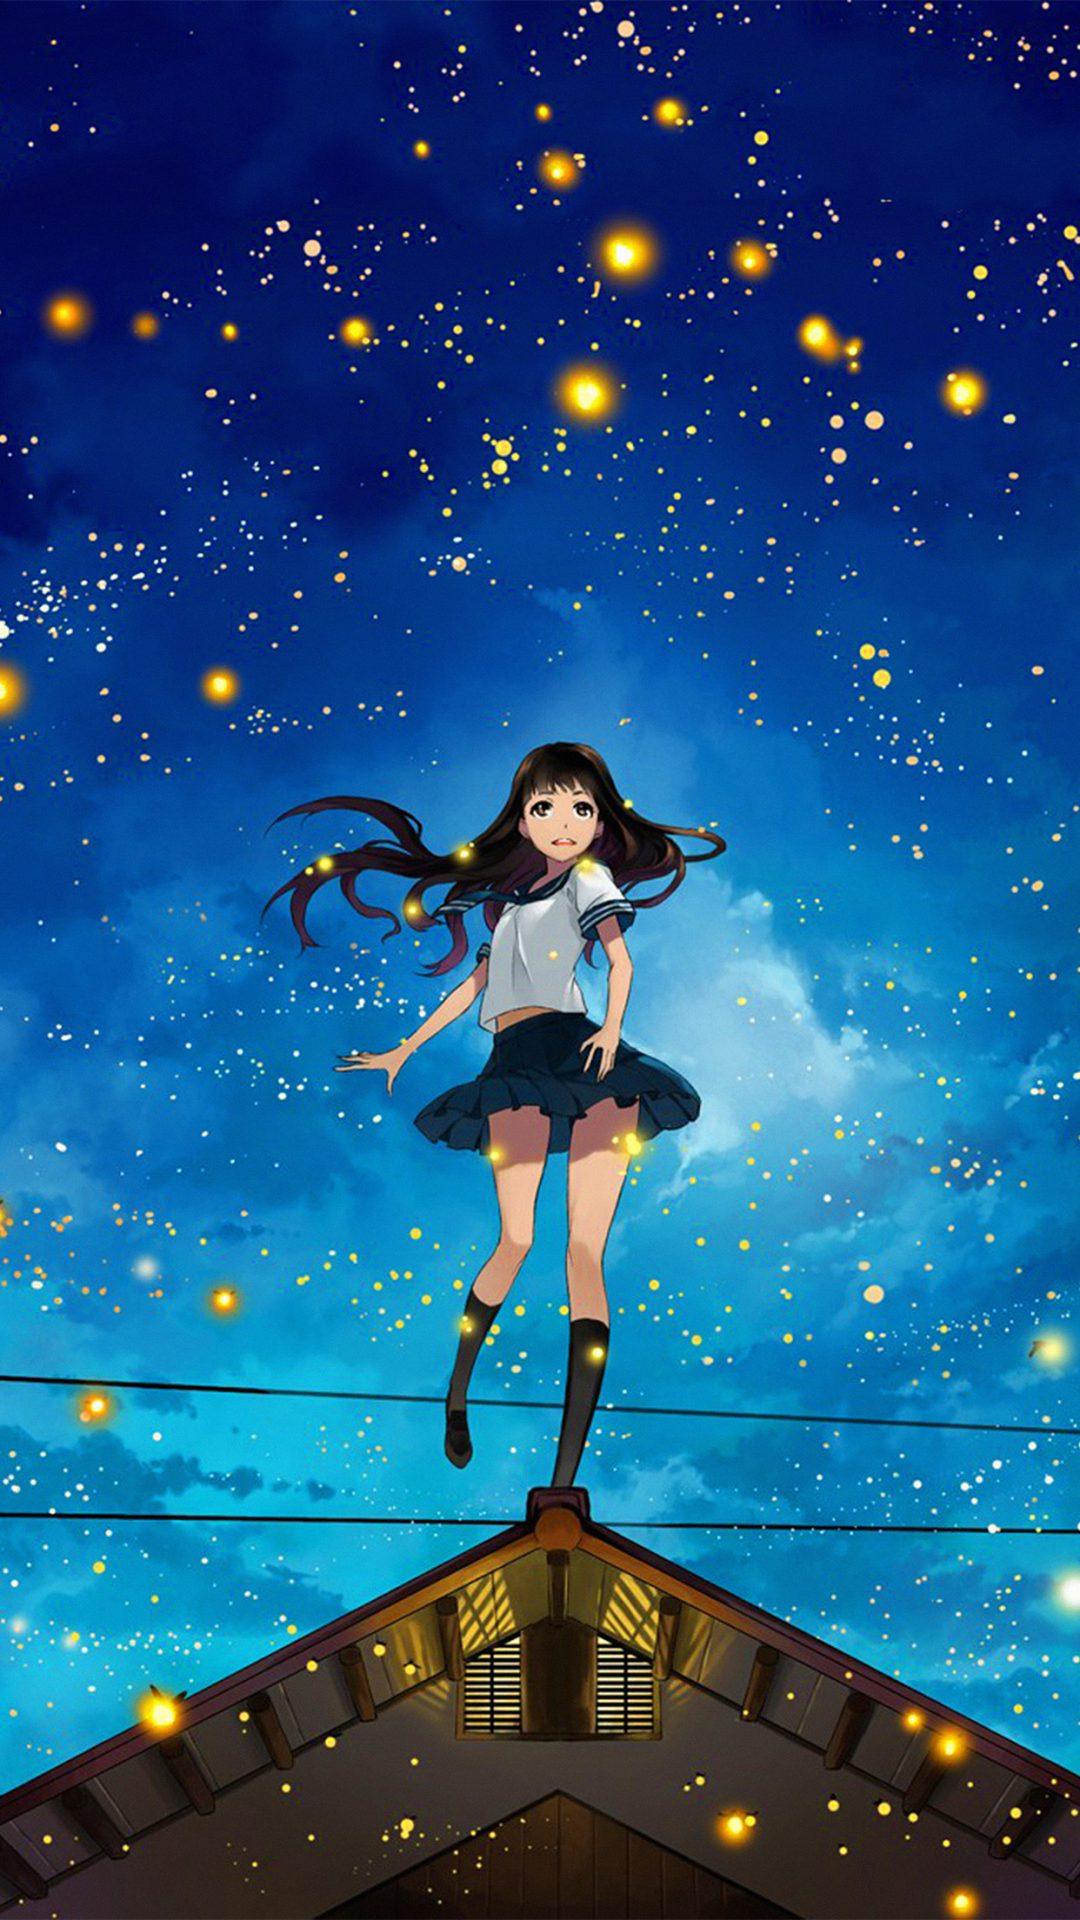 Girl Anime Star Space Night Illustration Art